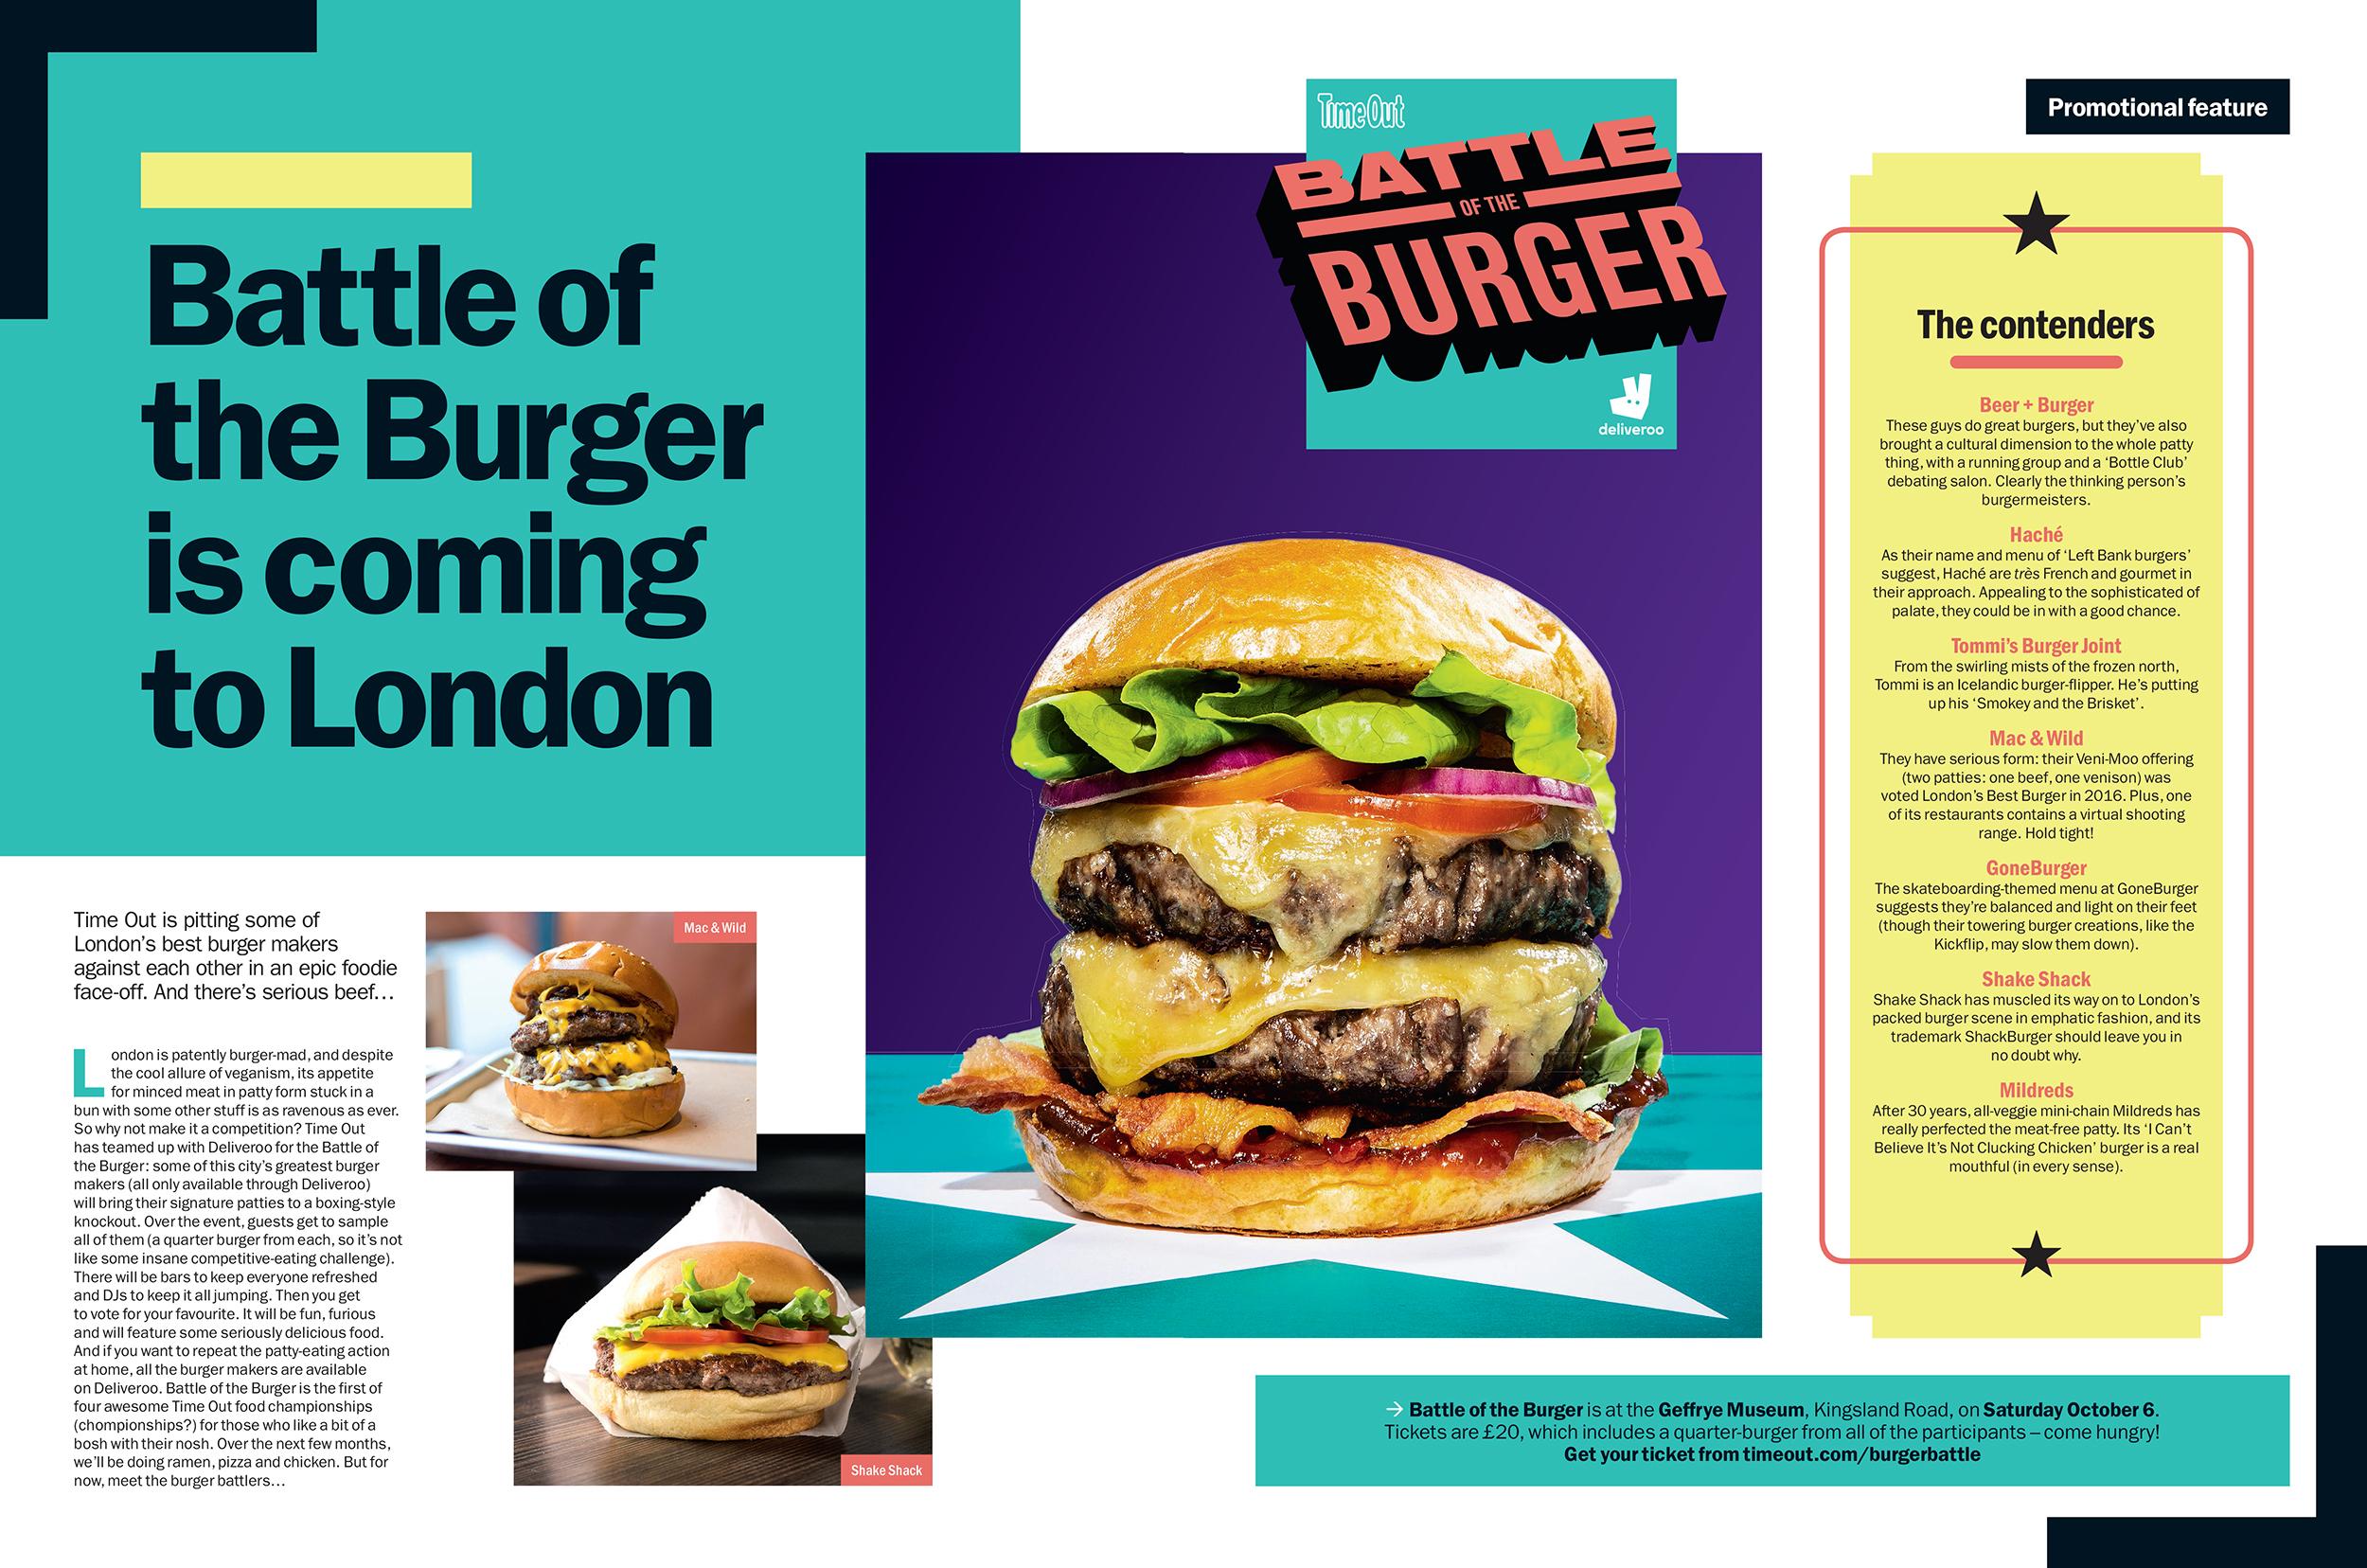 Battle of the Burger.jpg